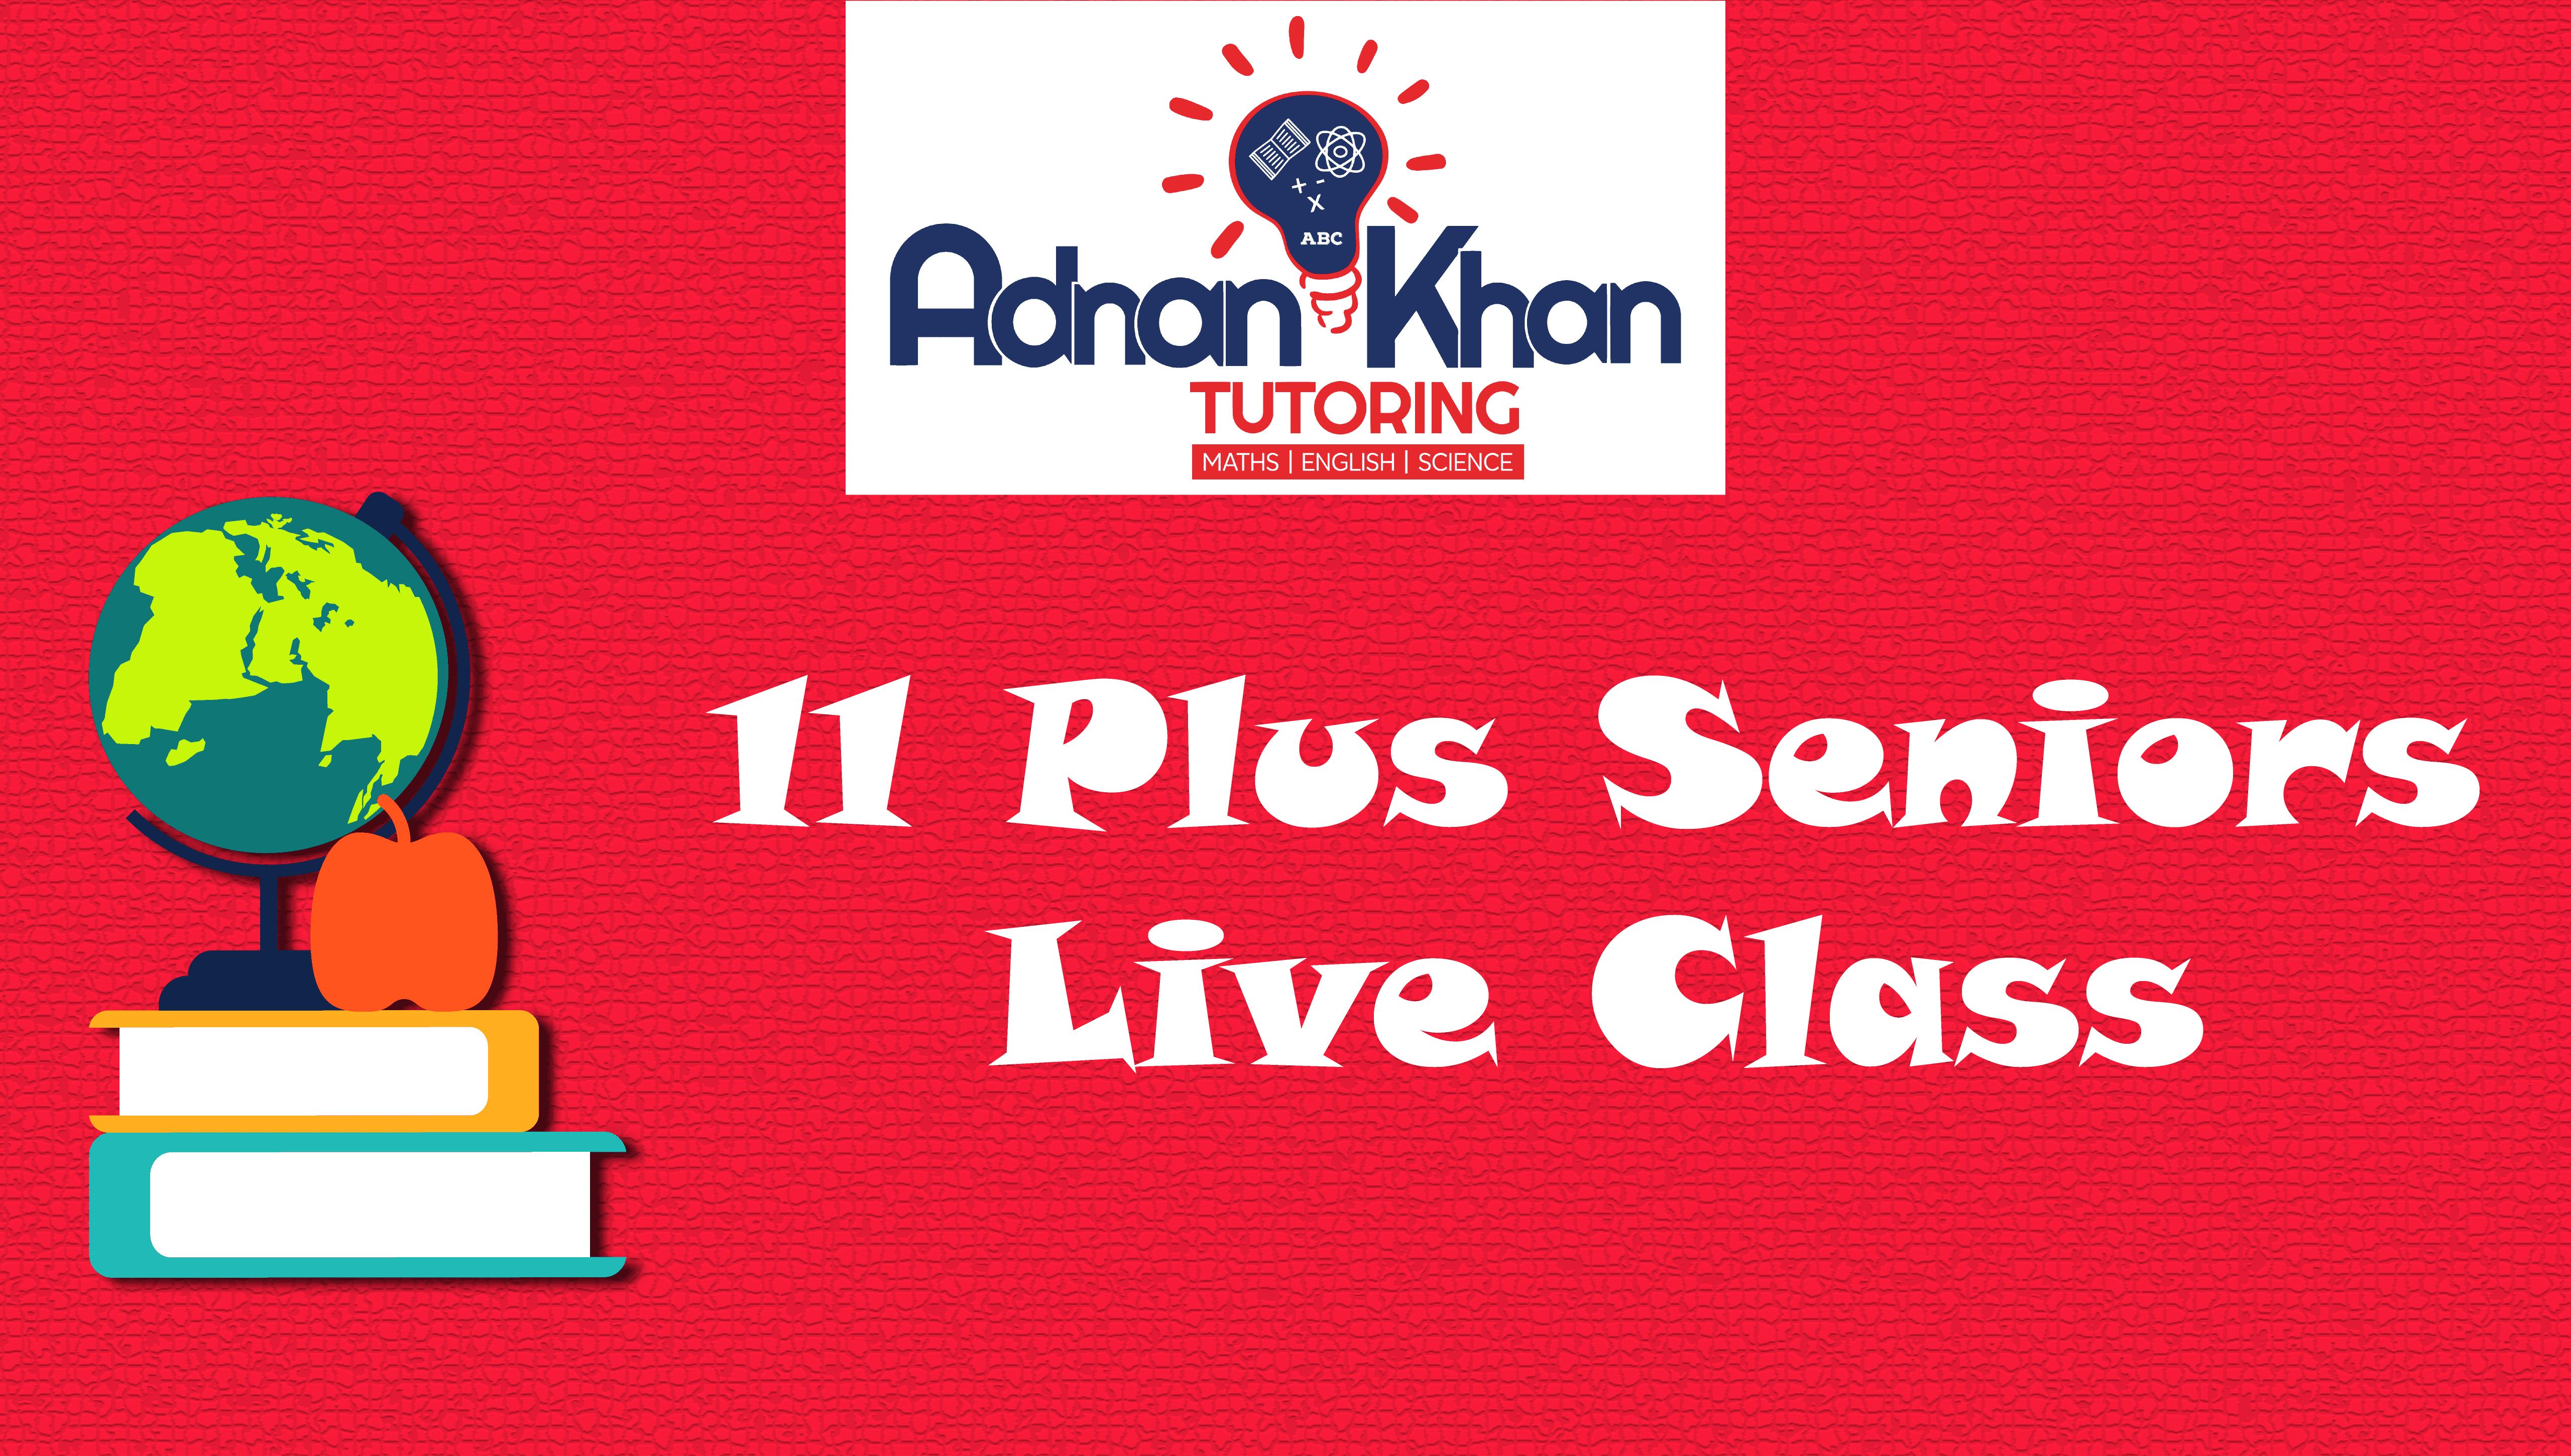 11 Plus Senios Live Class Adnan Khan Tutoring